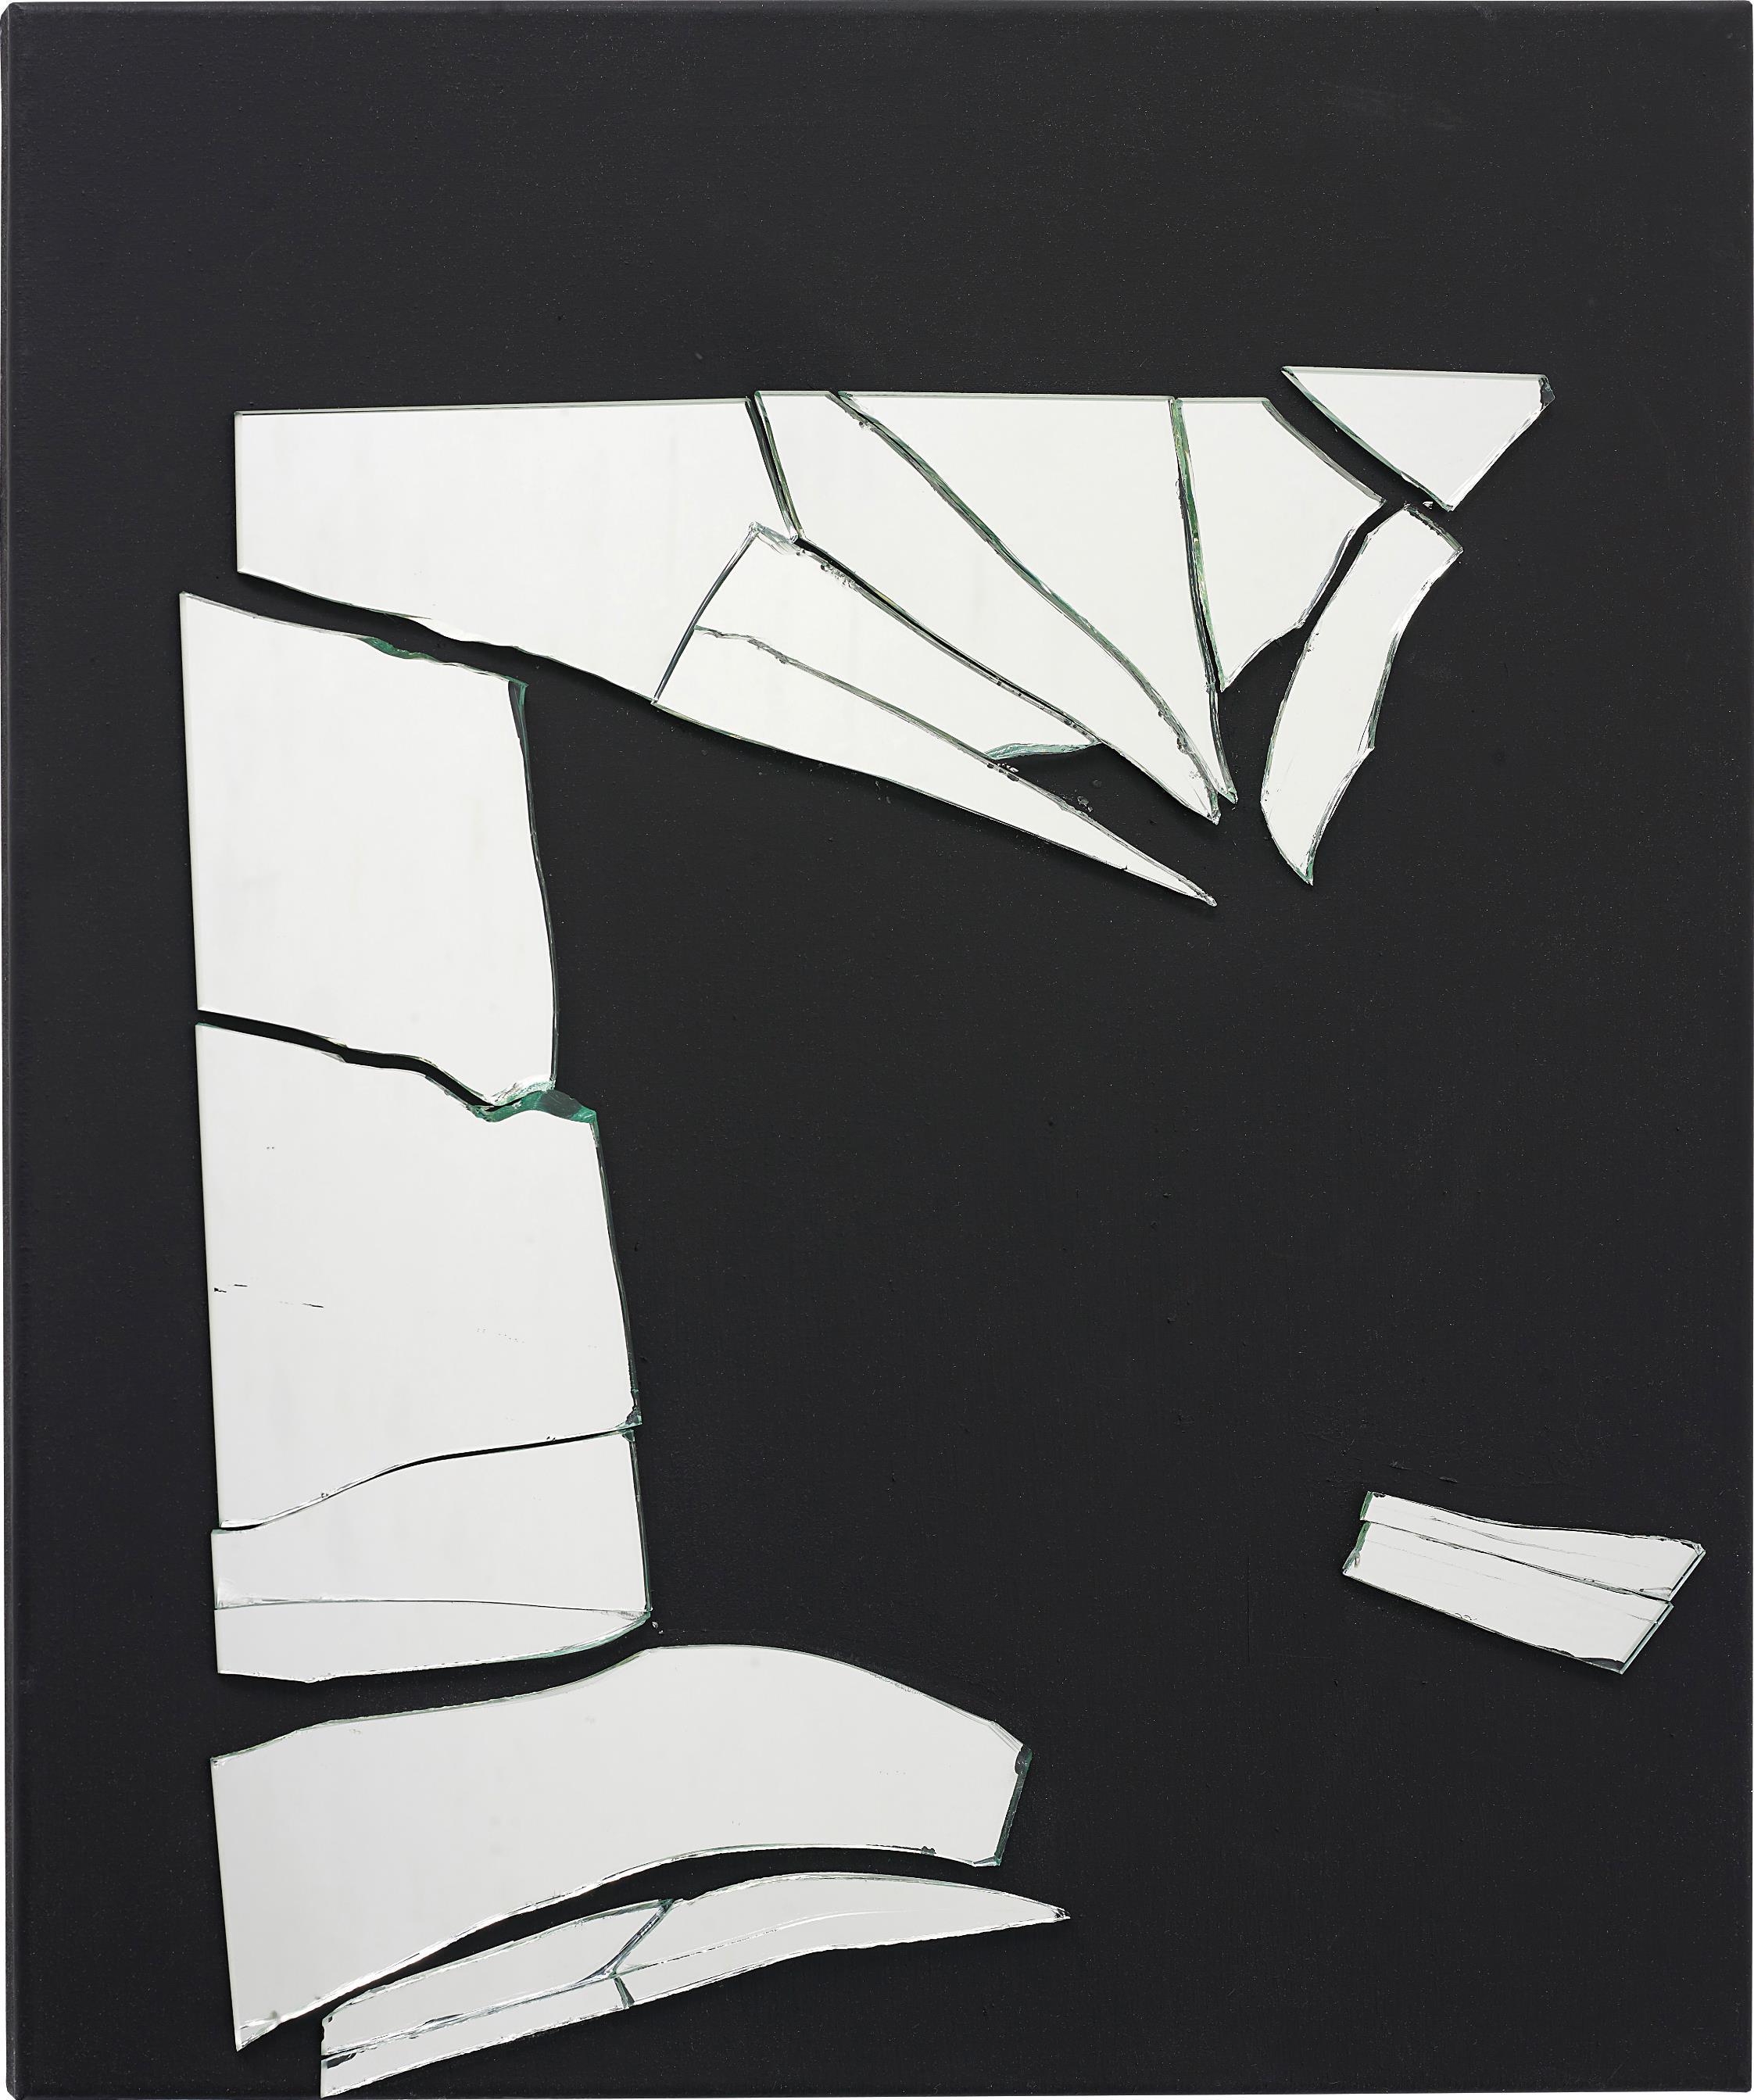 Anselm Reyle-Untitled-2003